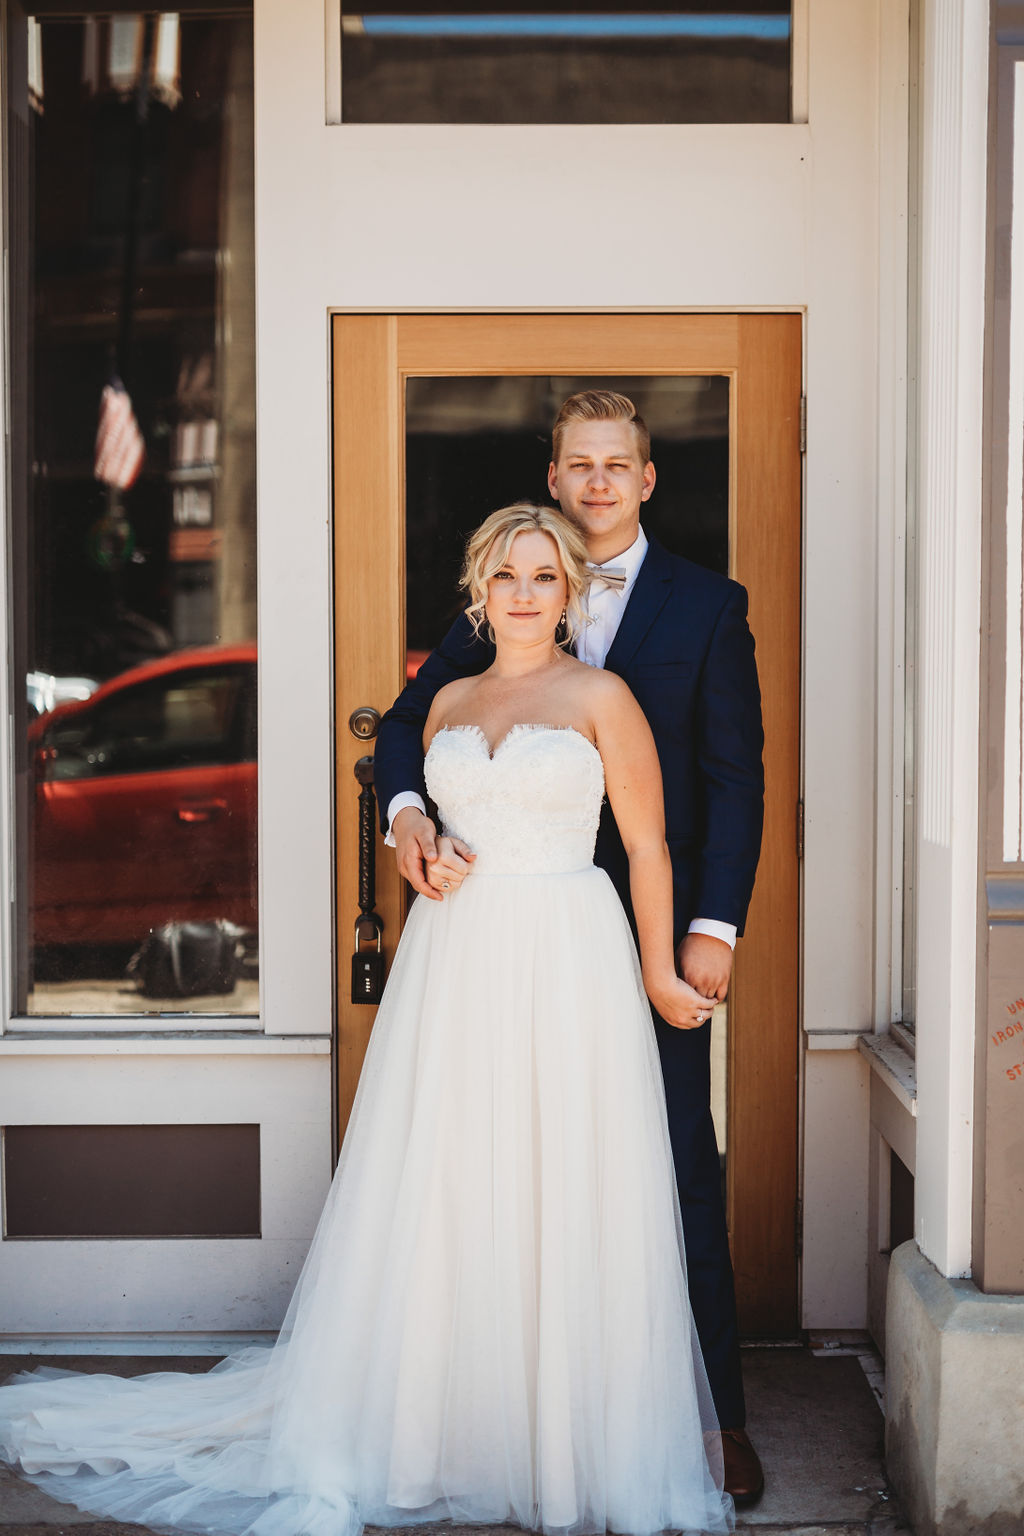 engle-olson-katie-dalton-wedding-clewell-photography-21.jpg